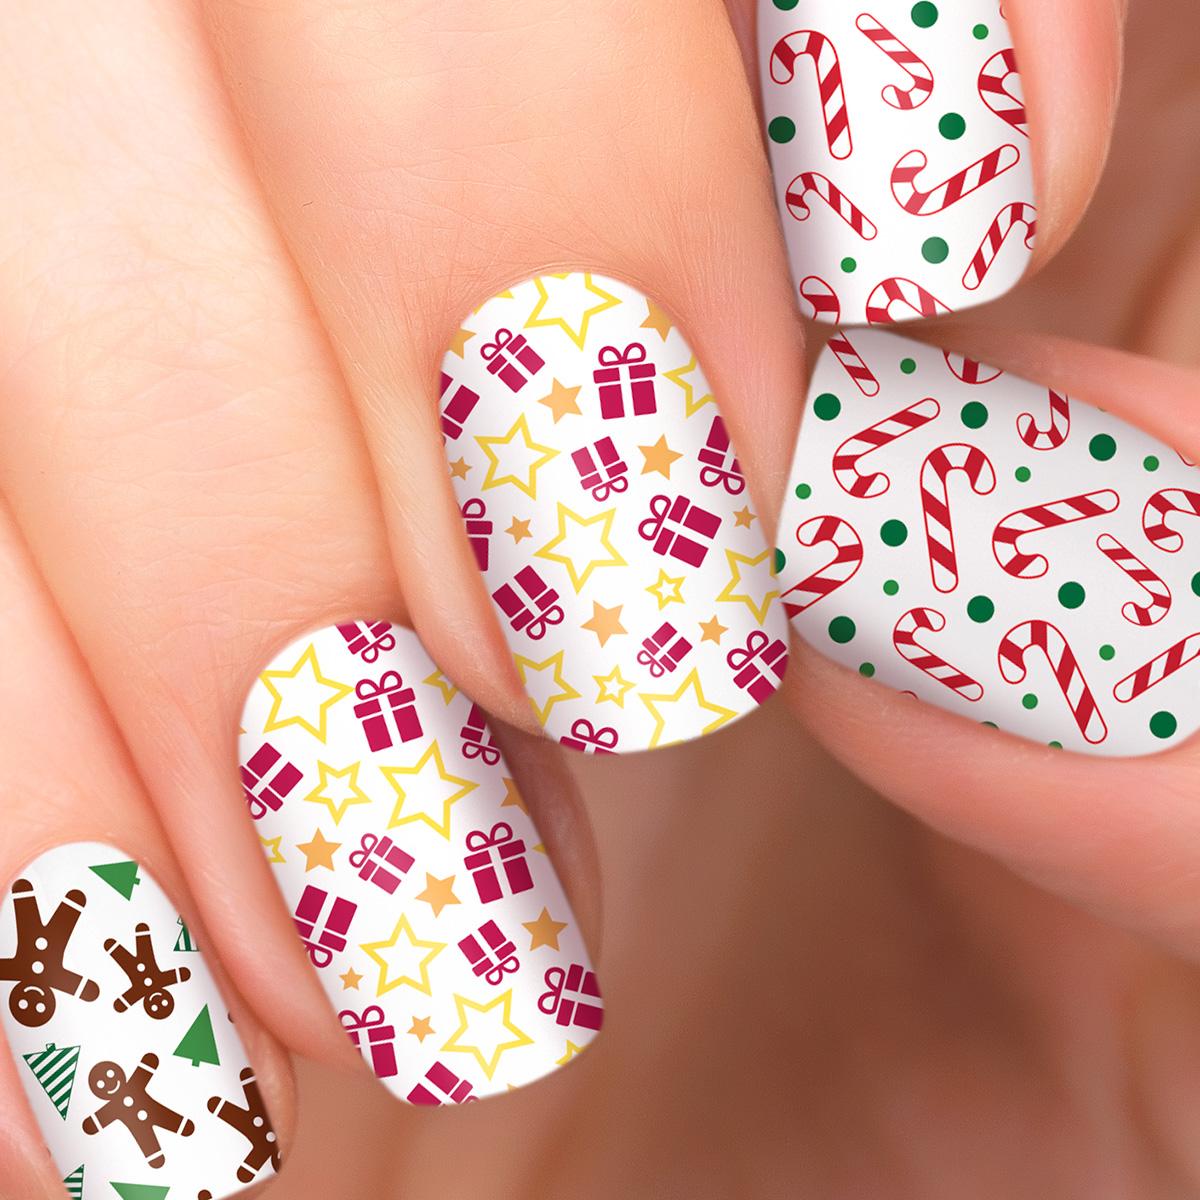 Incoco.com Incoco Nail Polish Strips, Holiday Treasures